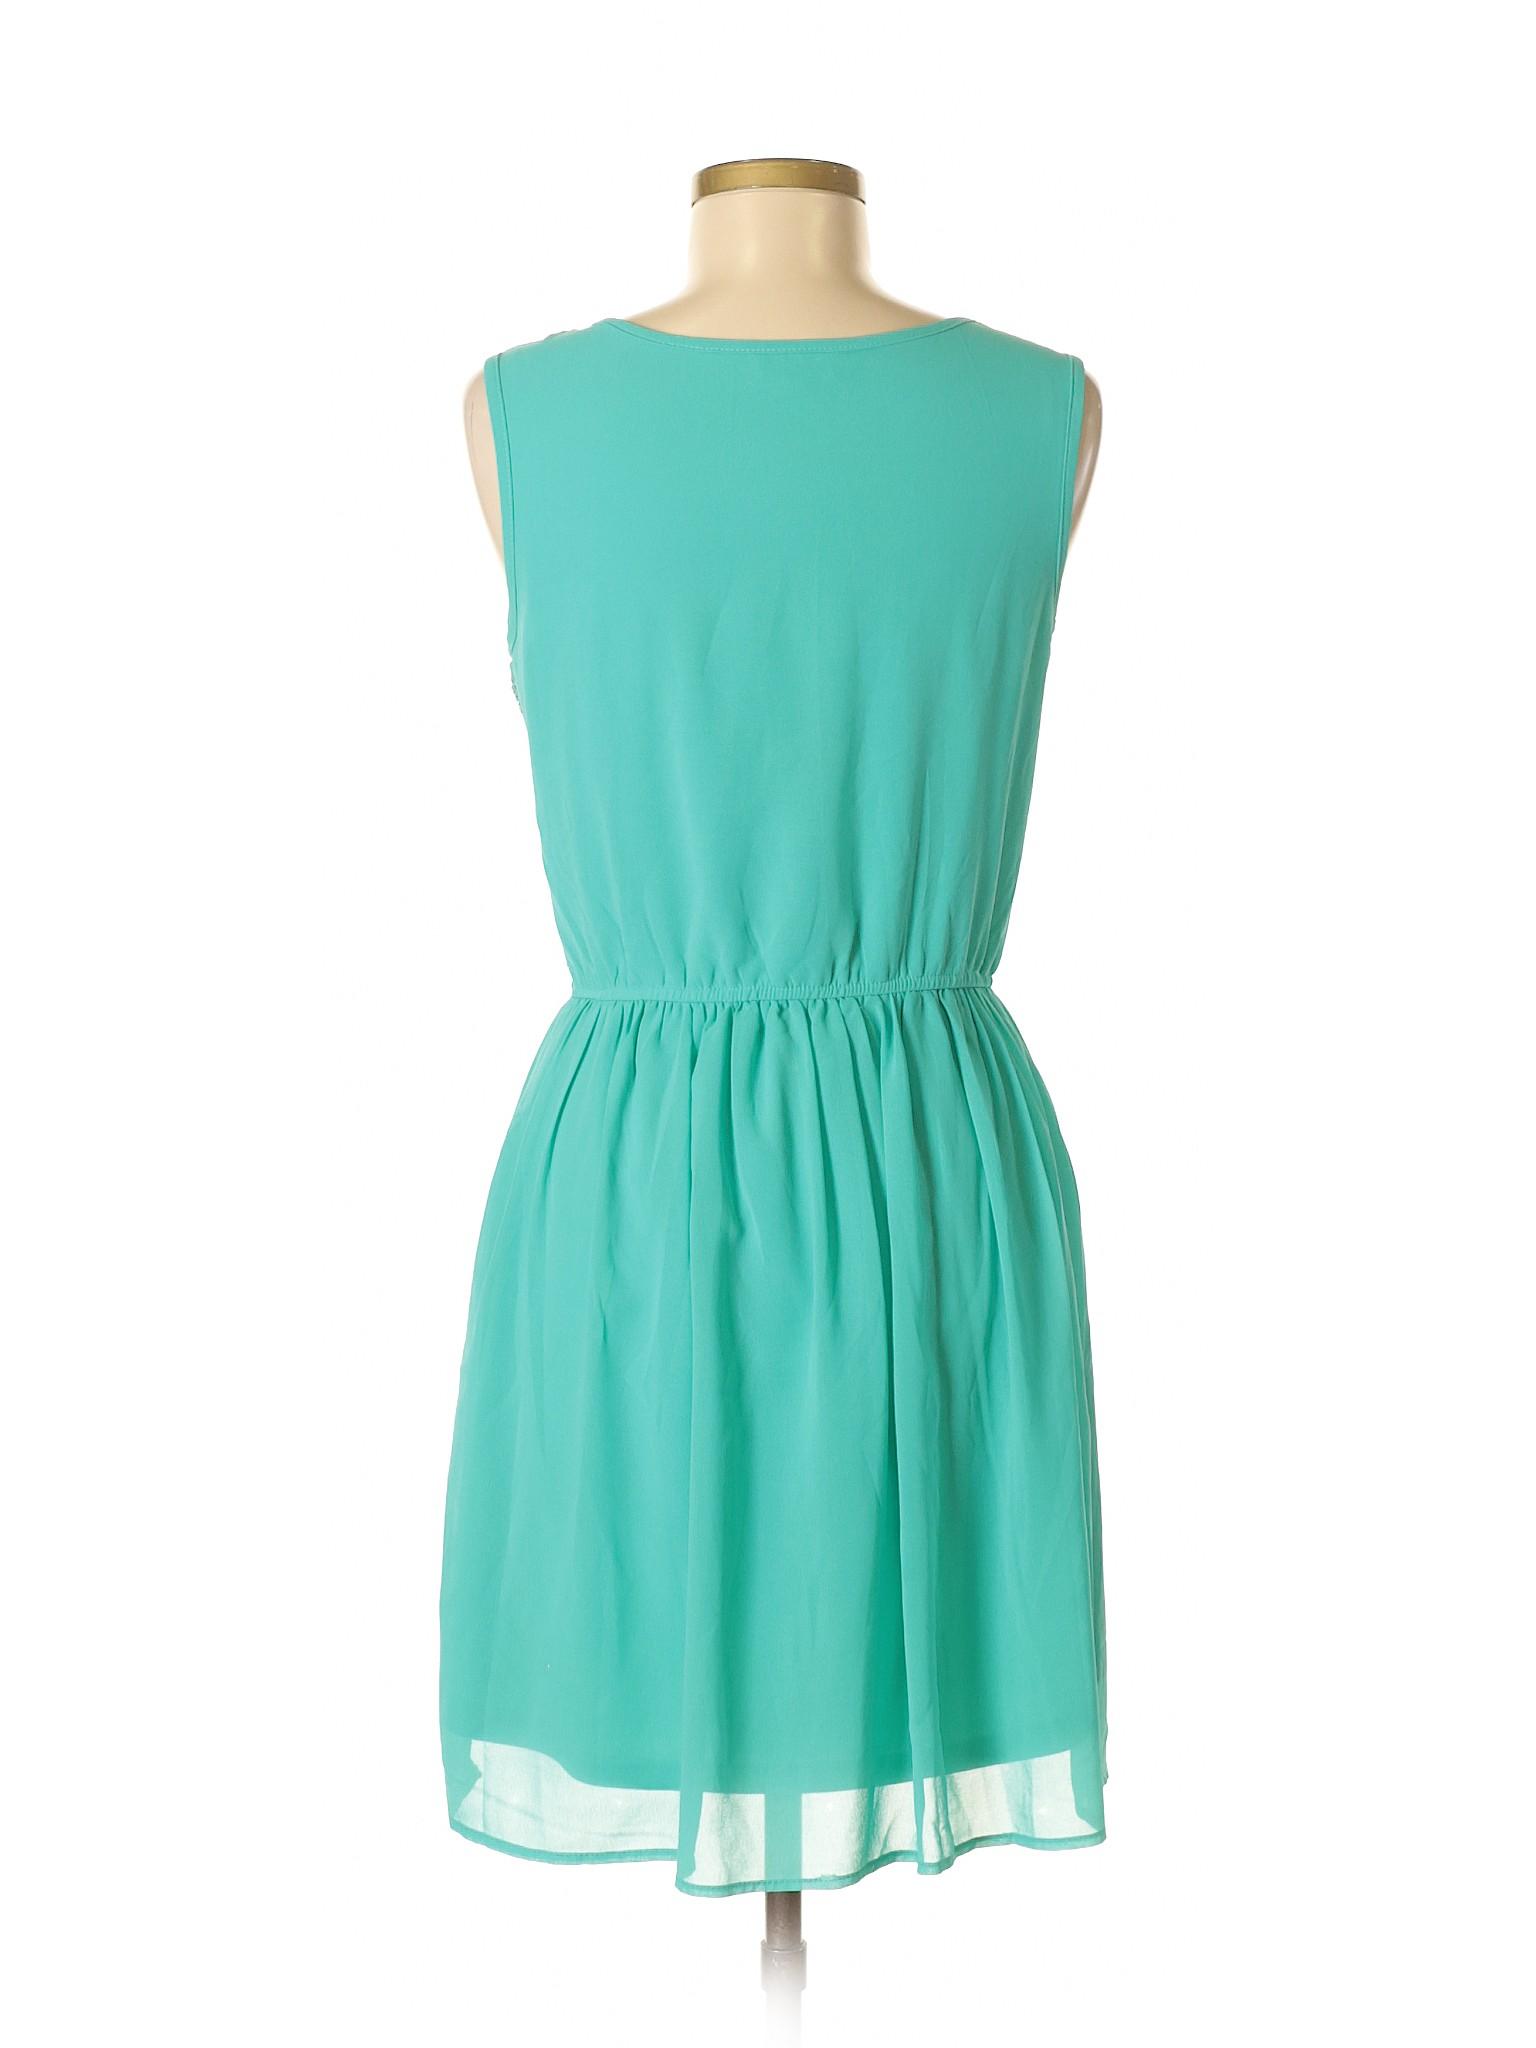 Ivy Dress Cocktail Jun amp; winter Boutique qxZtwY4Z